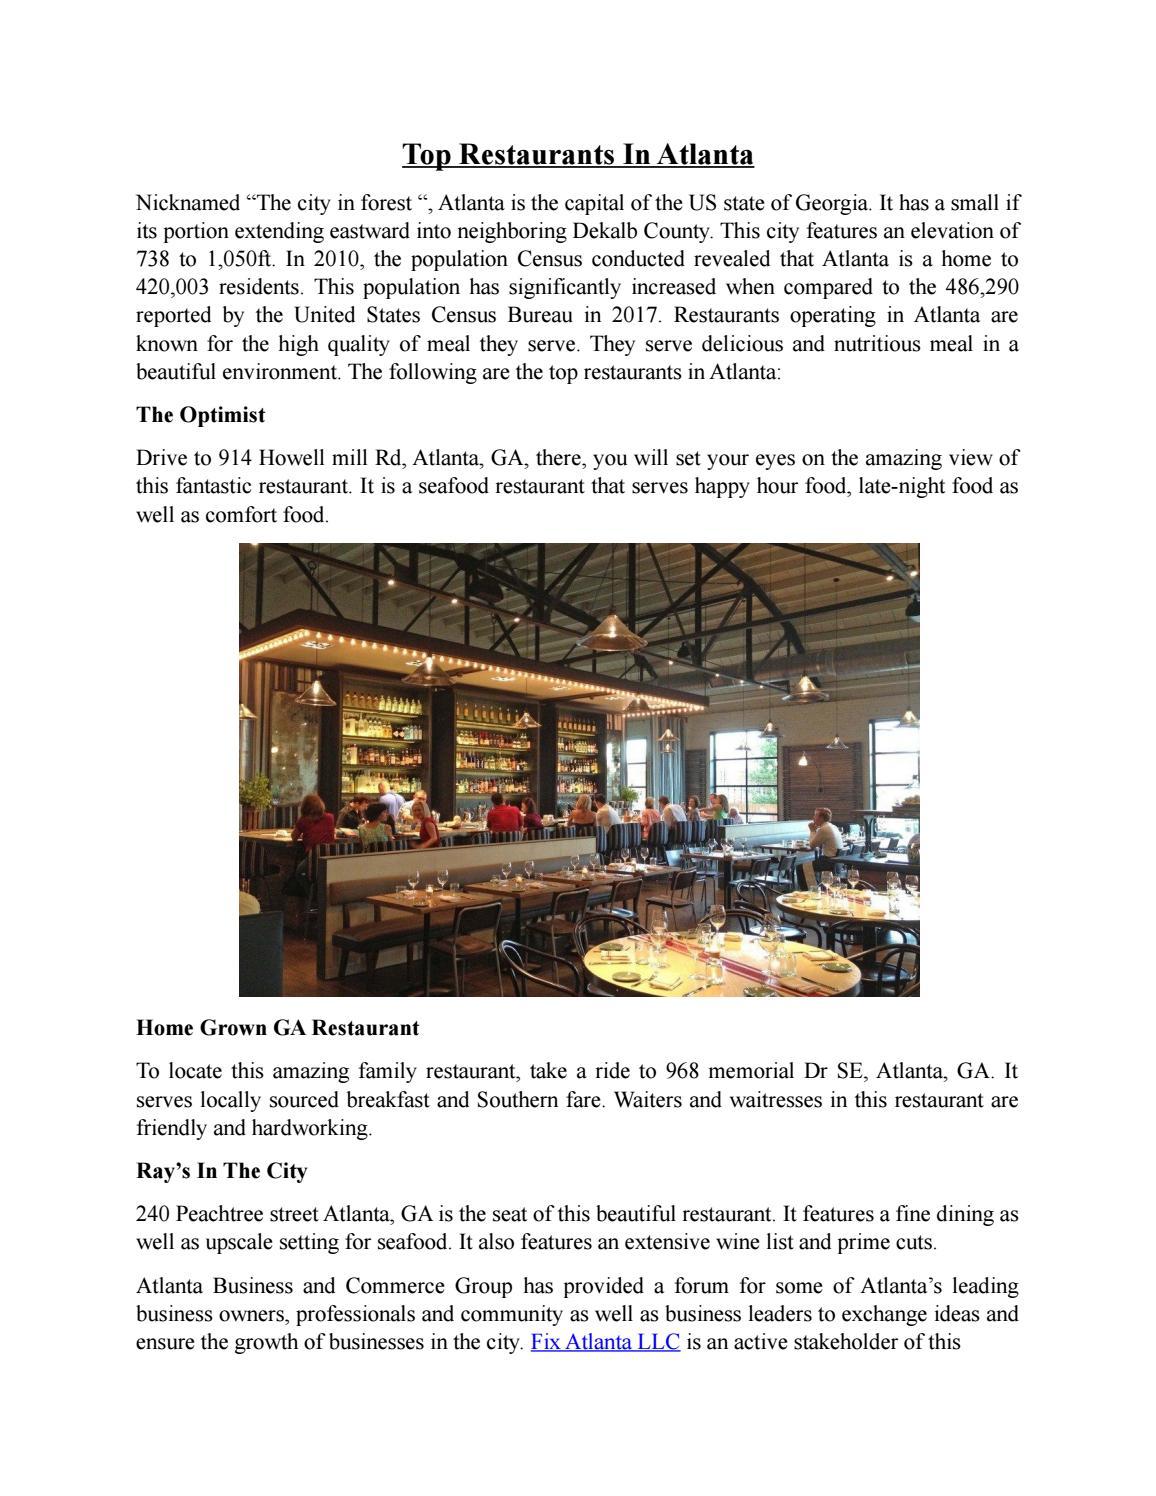 Top Restaurants In Atlanta By Atlanta Business And Commerce